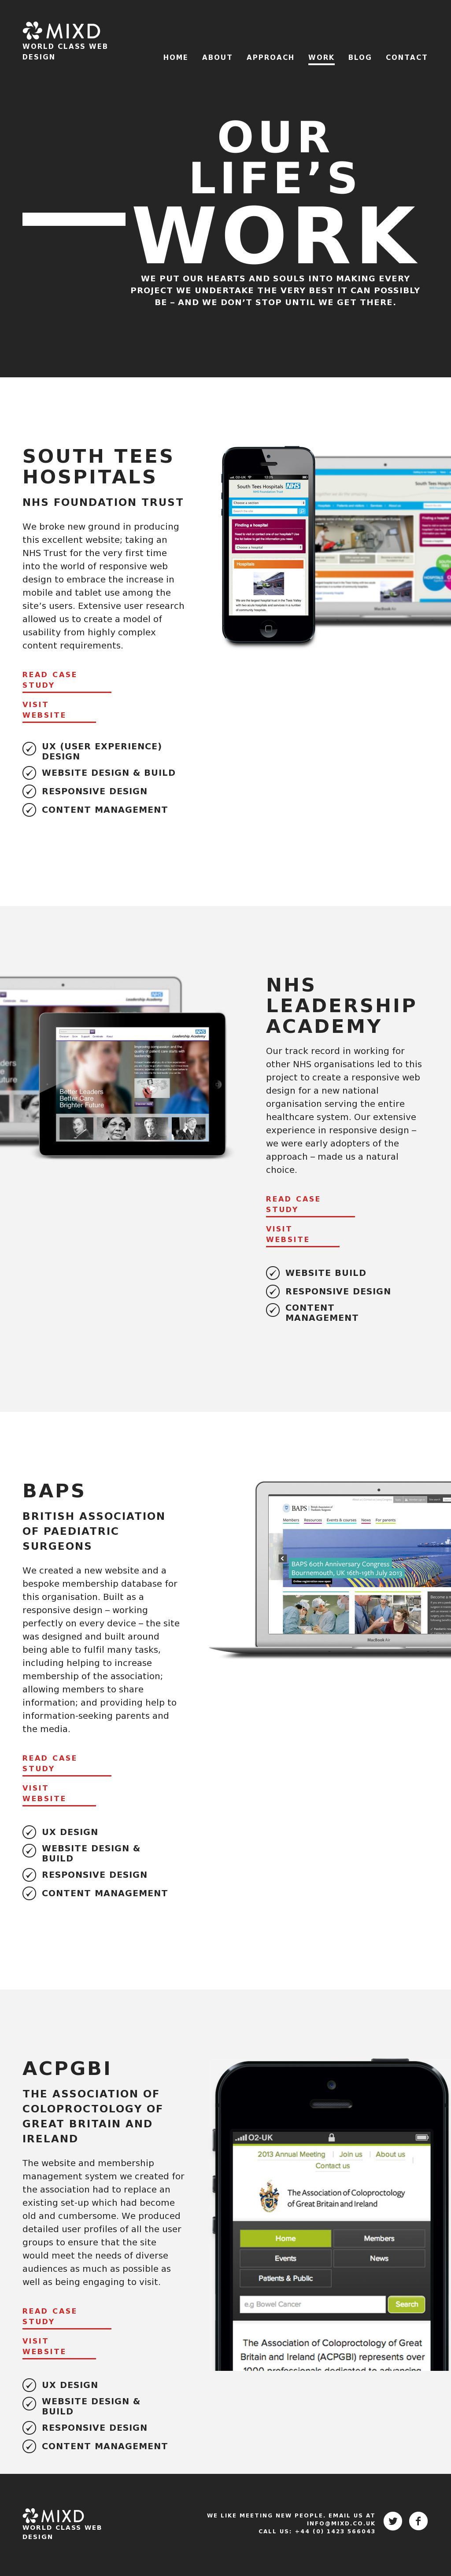 Http Www Mixd Co Uk Work Web Design App Design Design